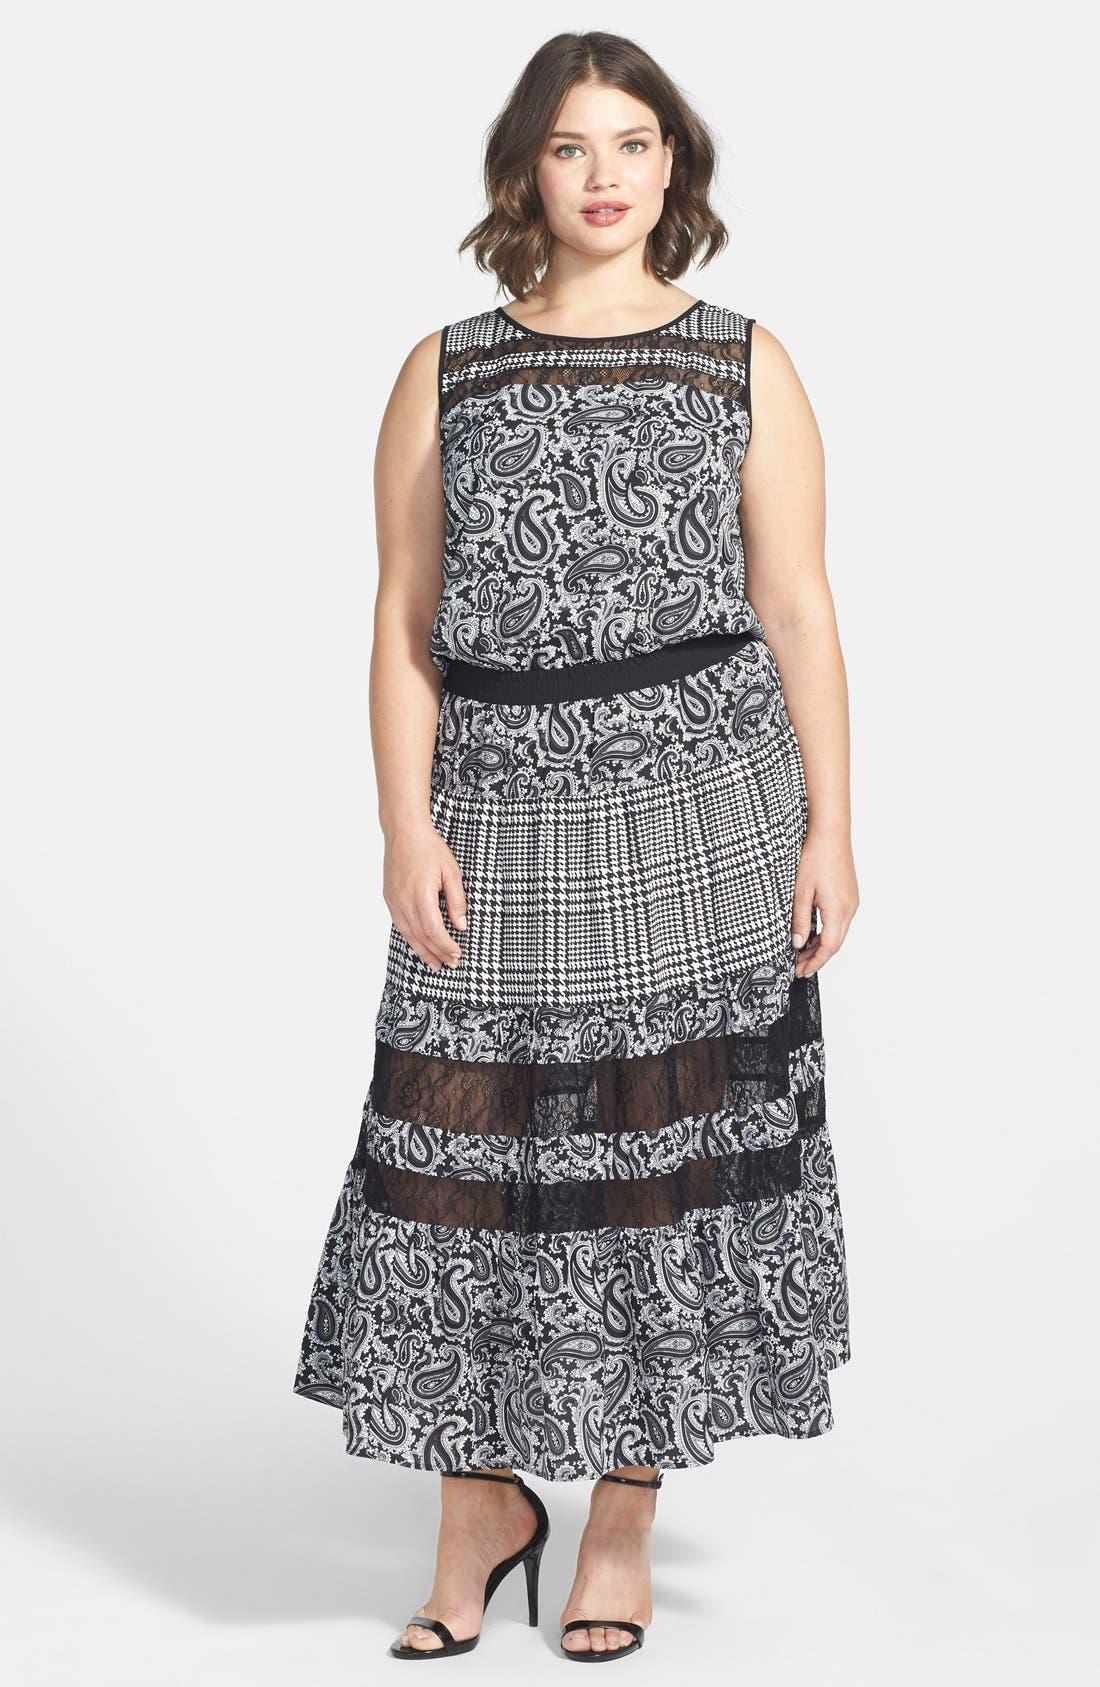 Alternate Image 1 Selected - MICHAEL Michael Kors 'Lazio' Mix Print Maxi Dress (Plus Size)